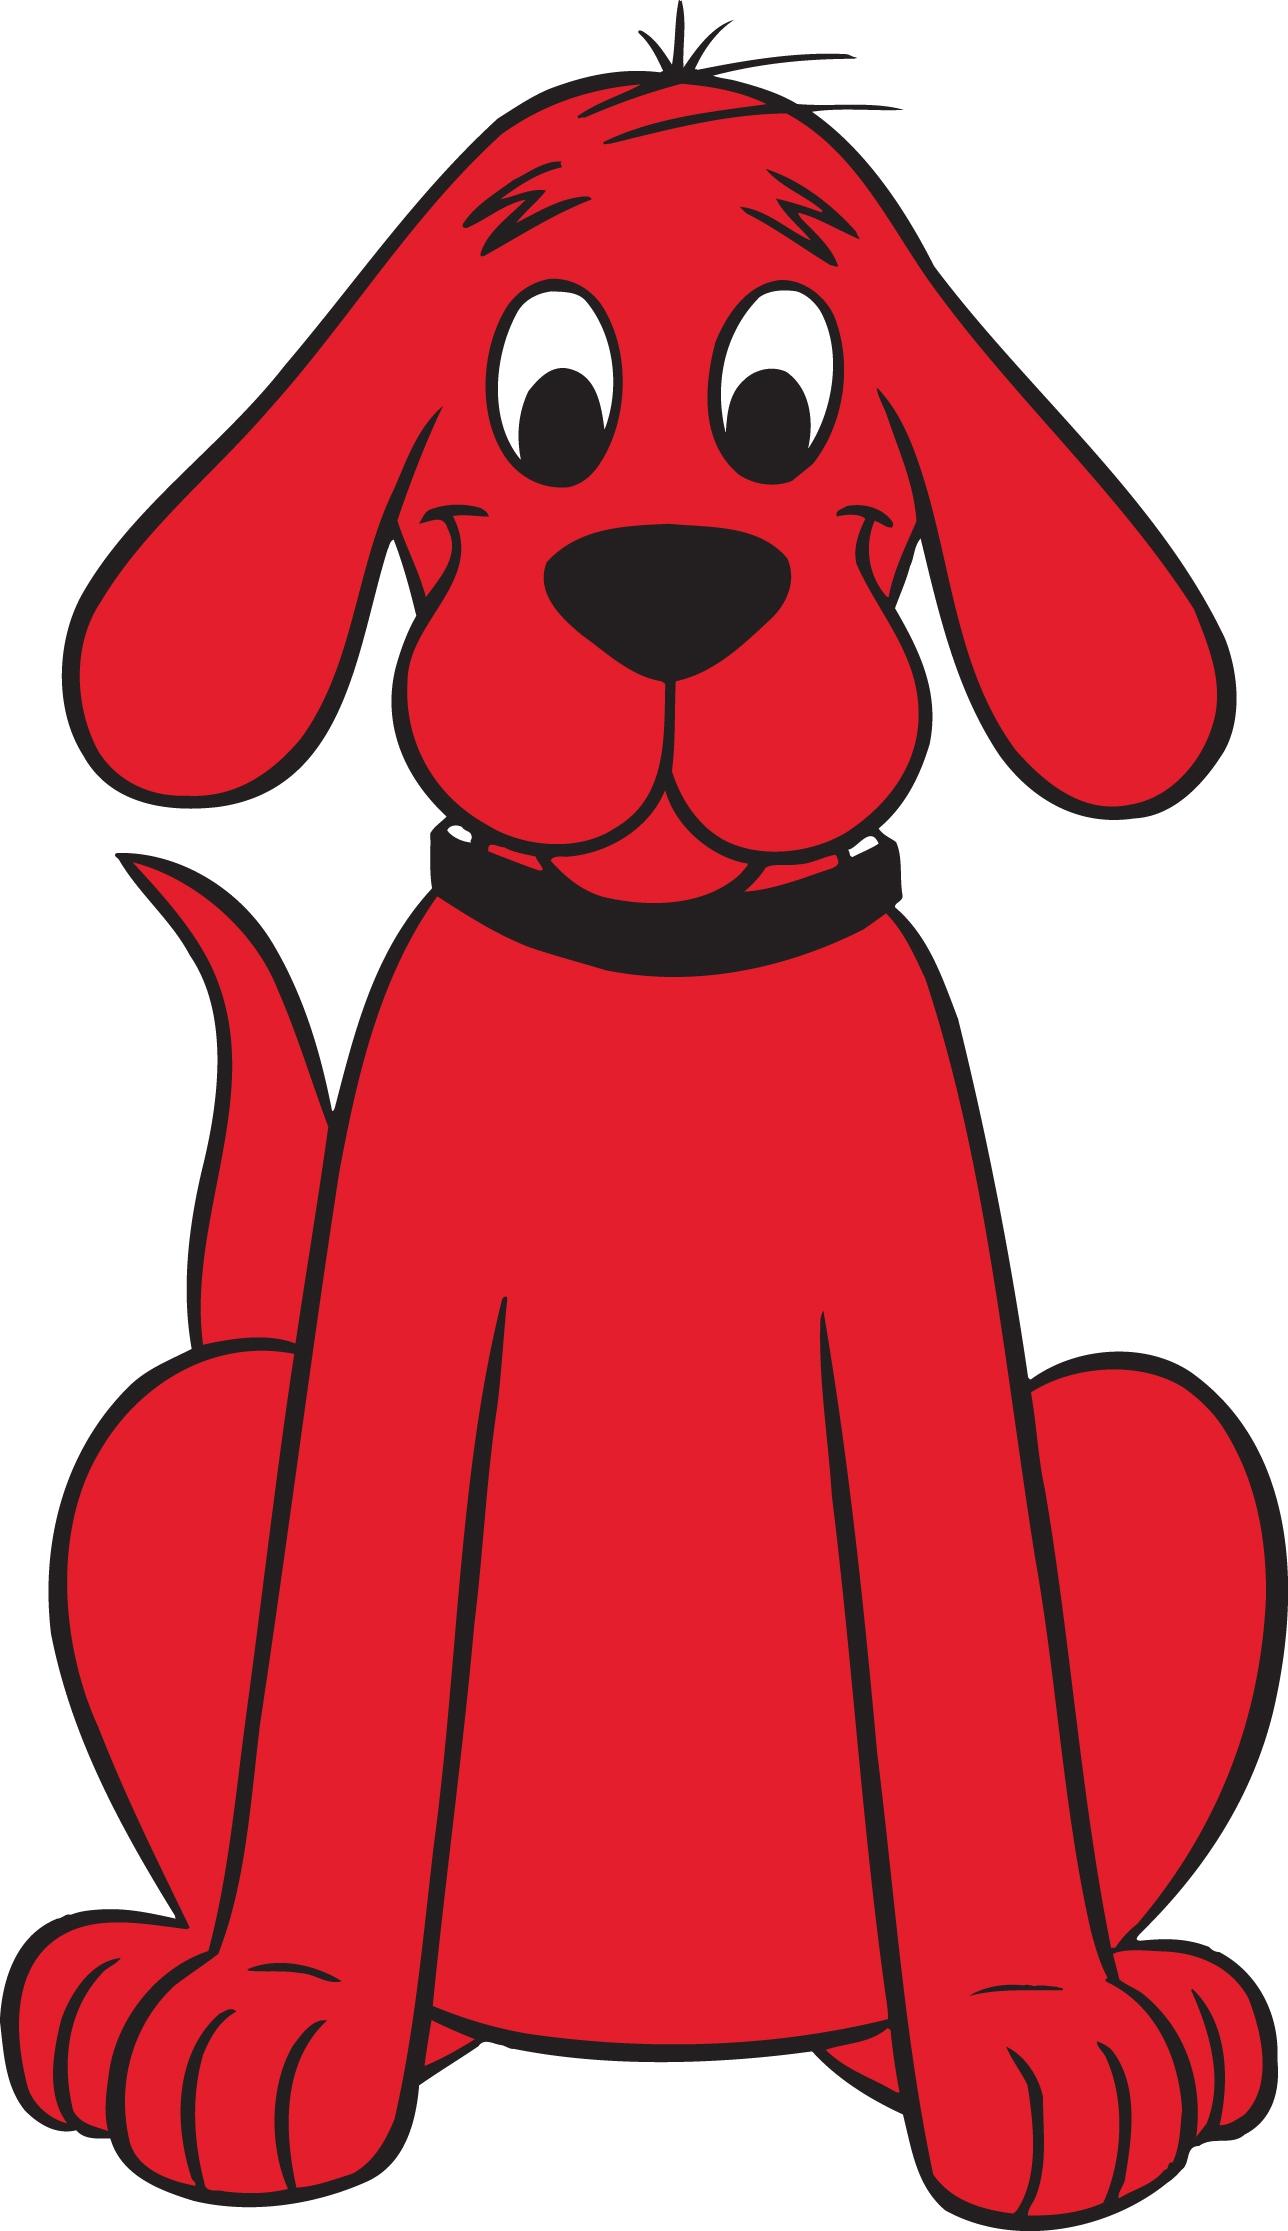 Big dog clip art graphic royalty free I love big dogs clipart - ClipartFest graphic royalty free